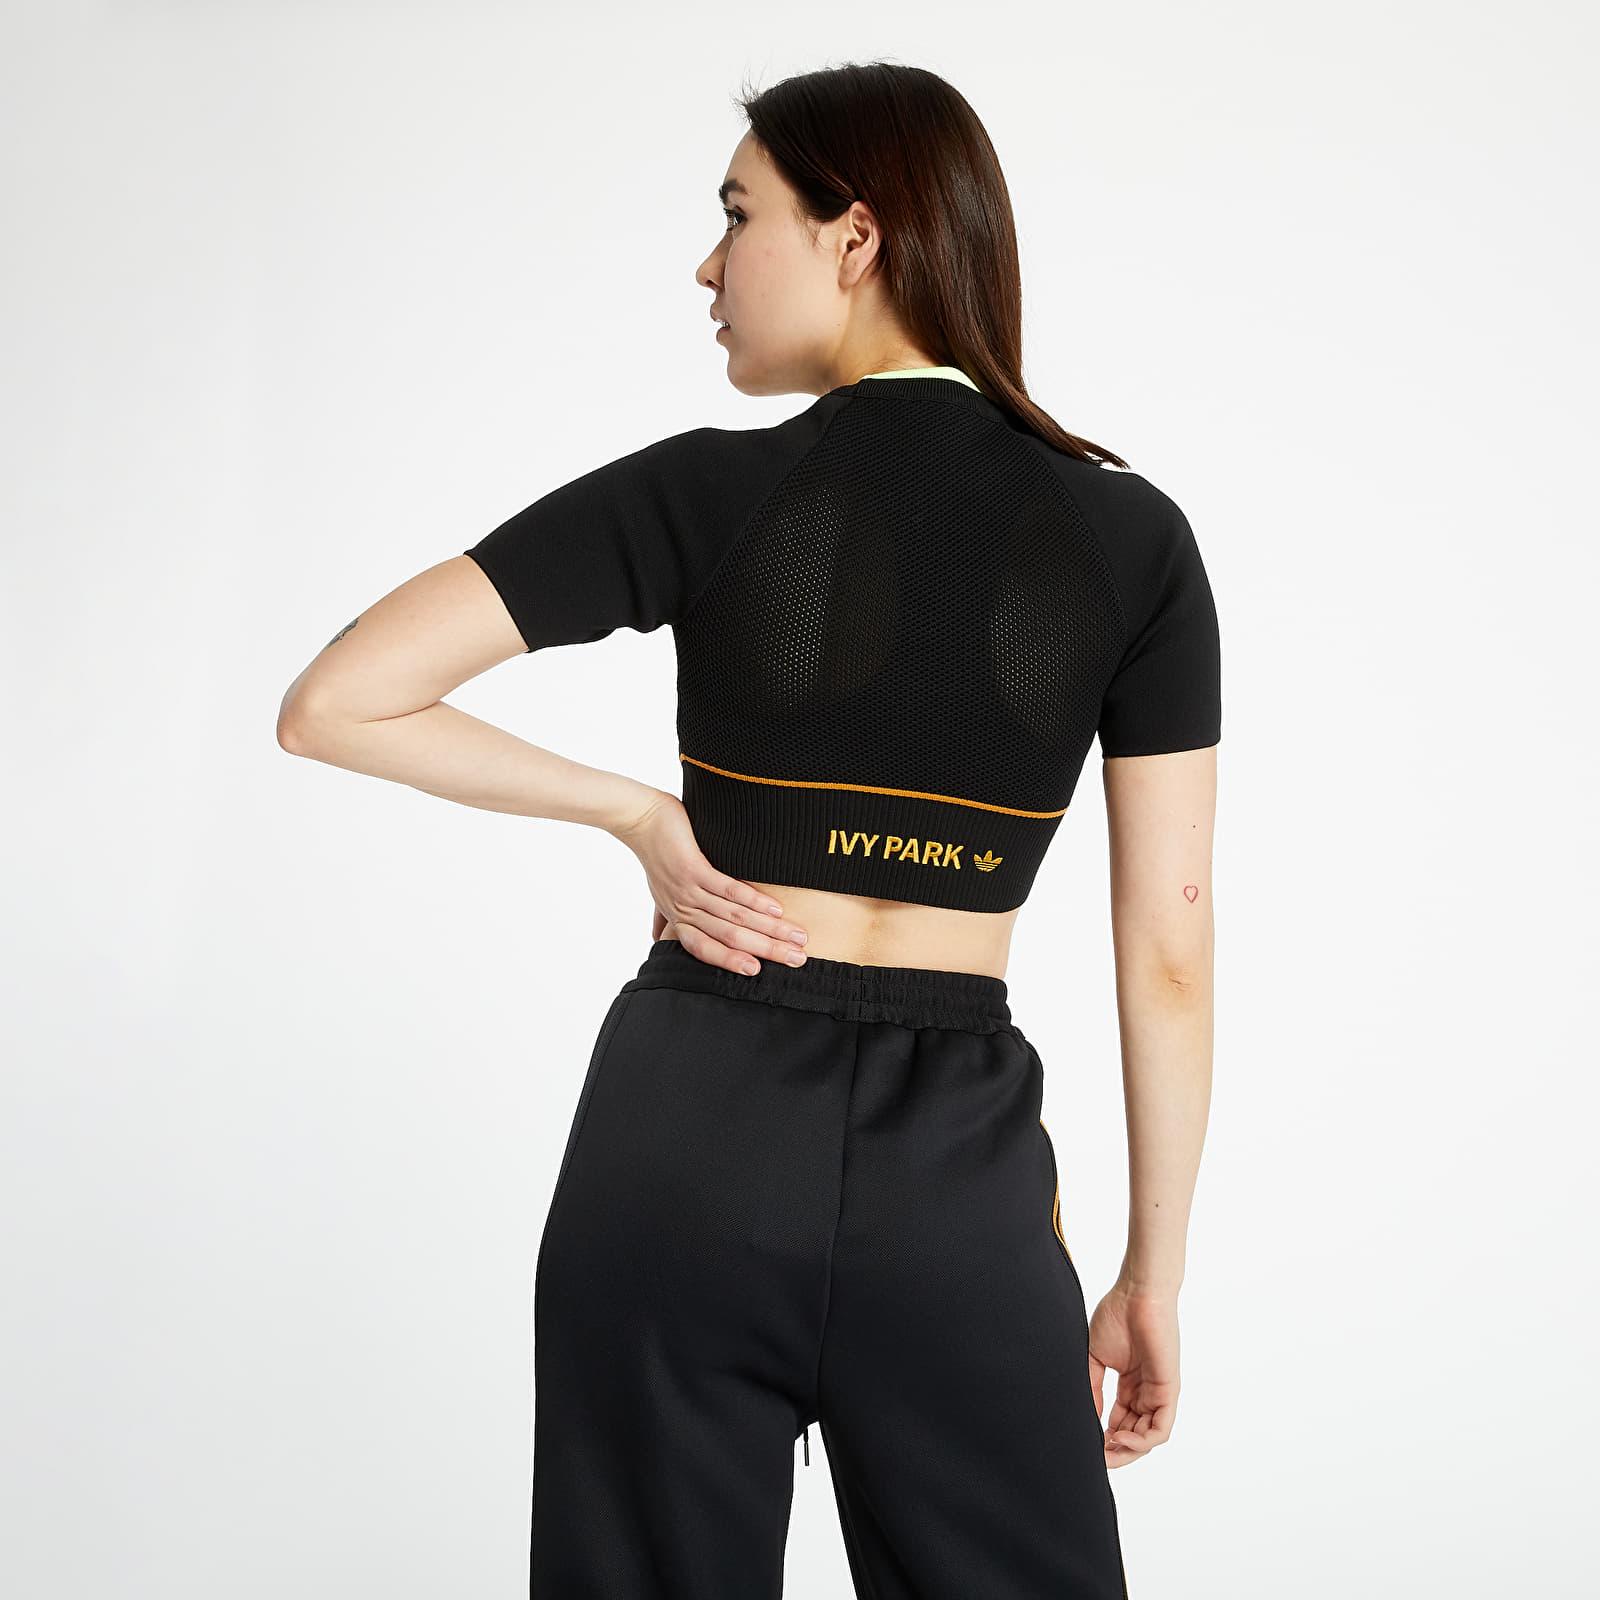 T-shirts adidas x Ivy Park Knit Crop Top Black/ Mesa